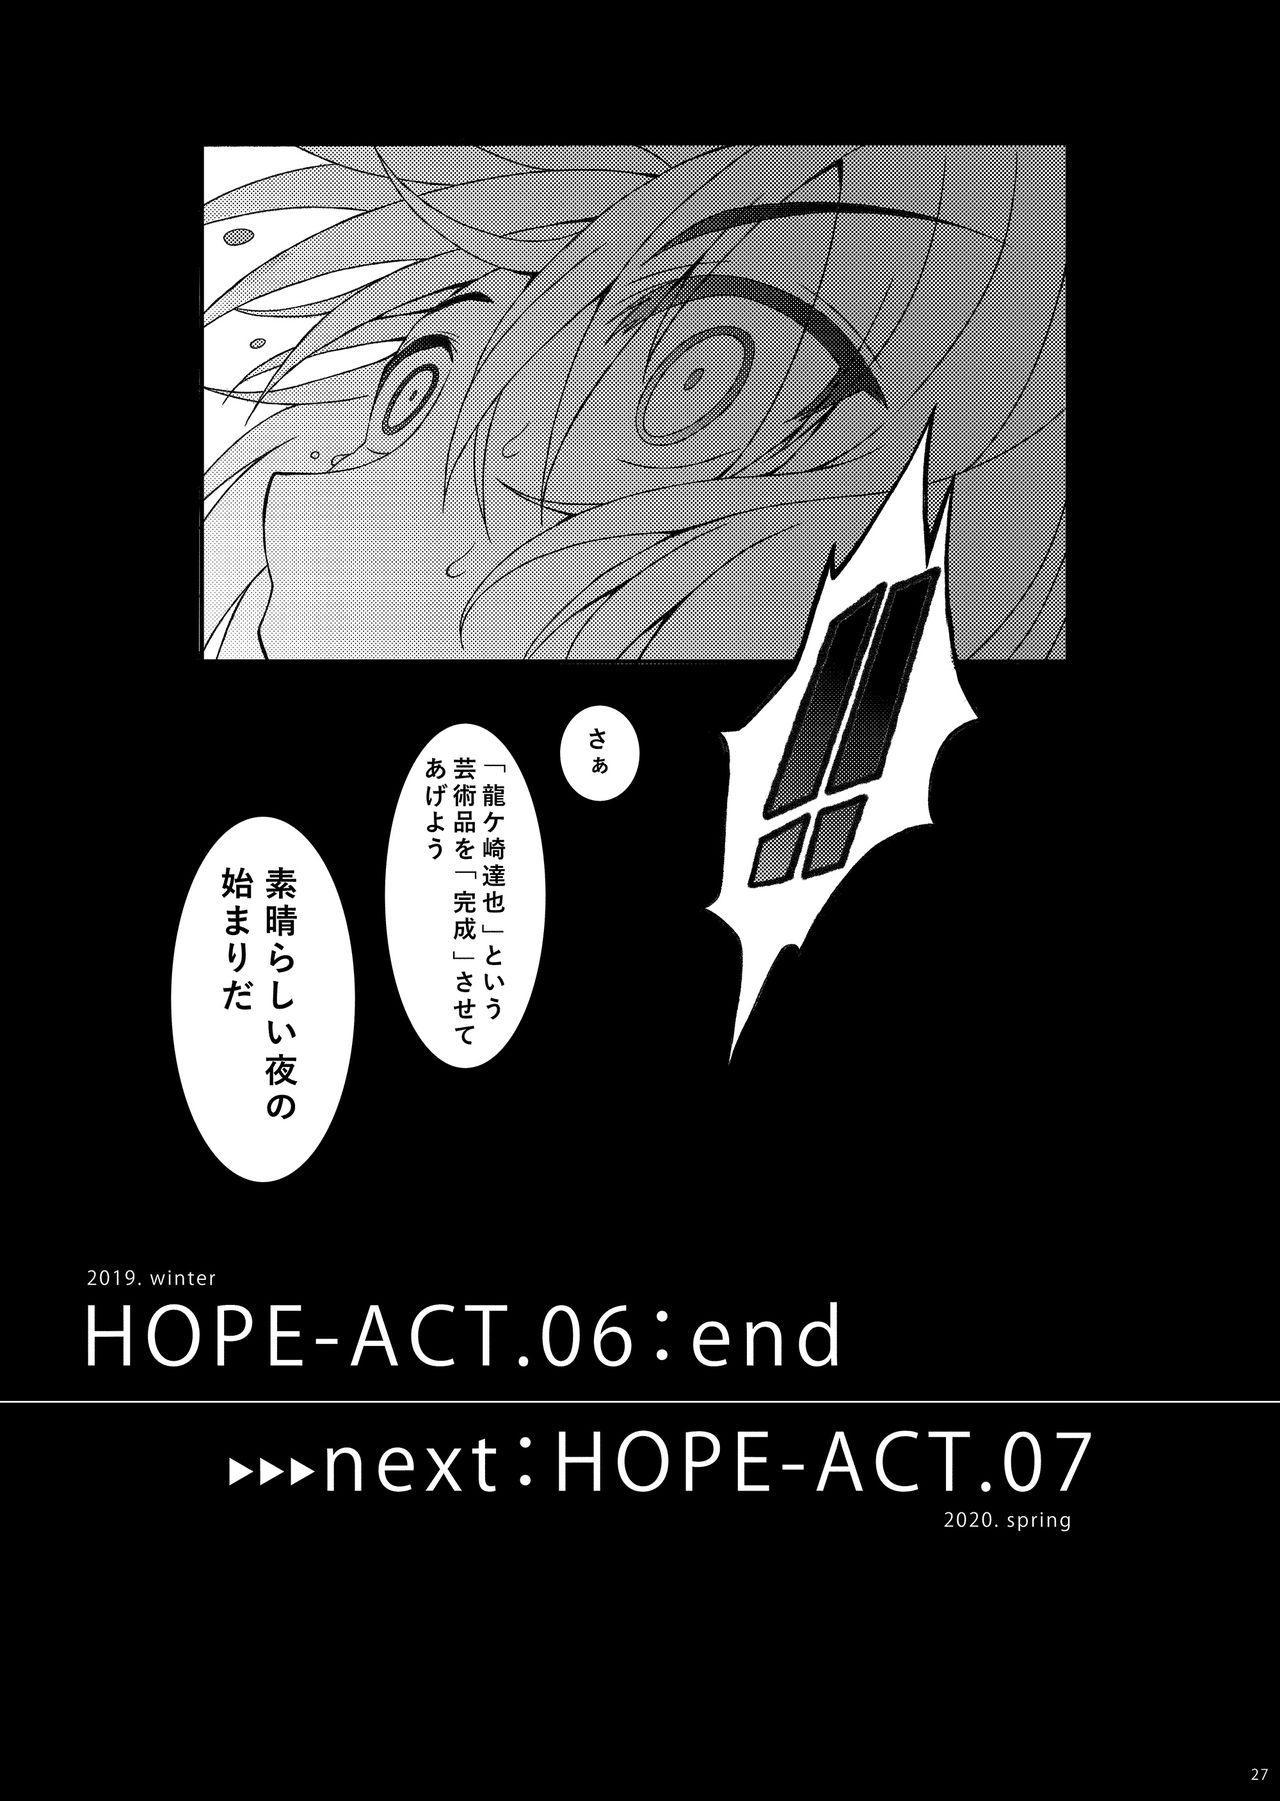 HOPE-ACT. 06 26